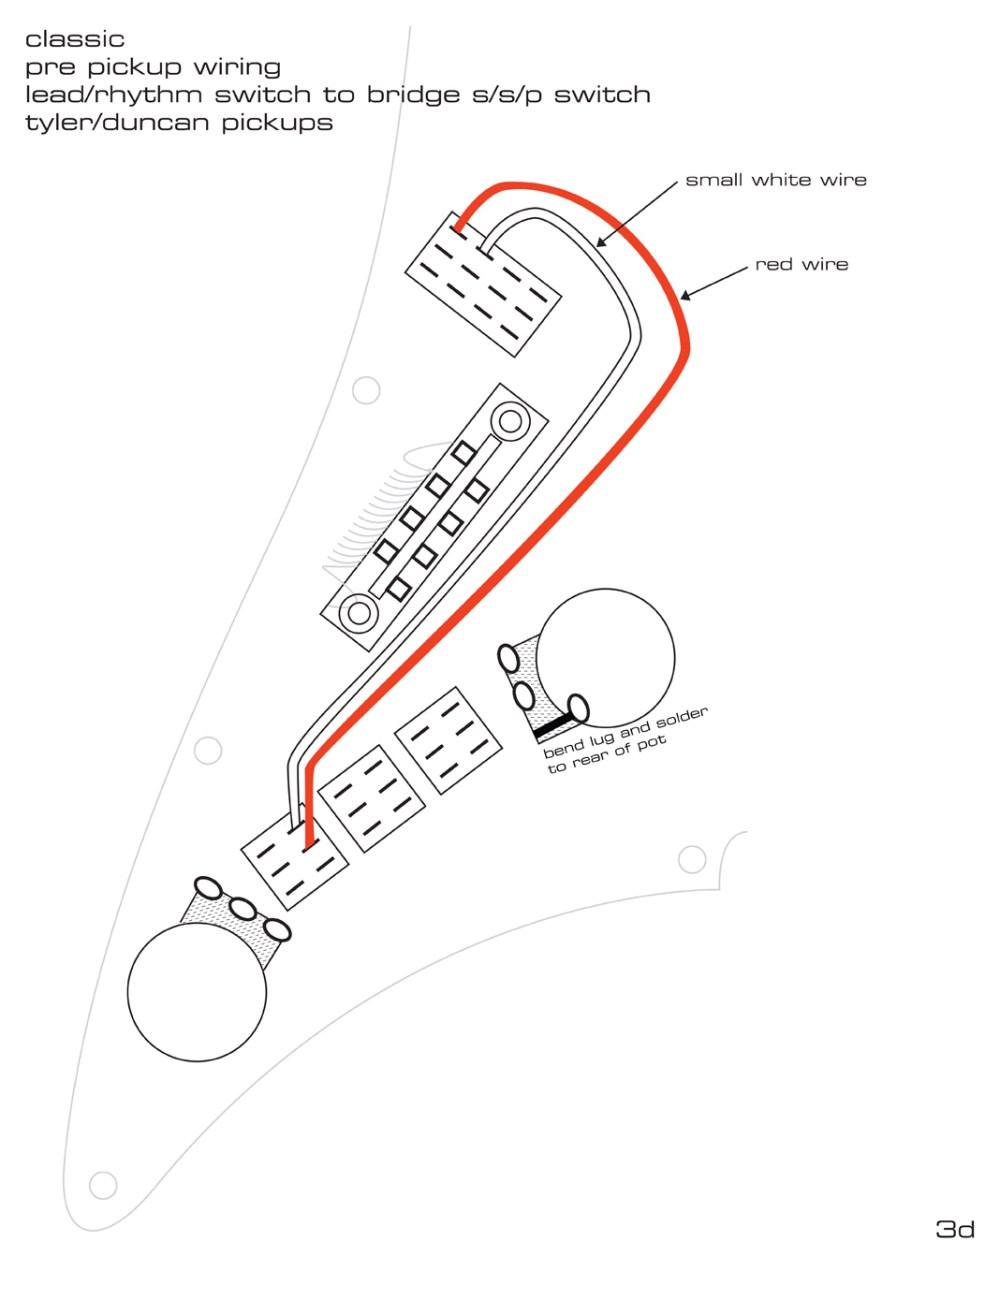 medium resolution of classic tyler duncan wiring diagram page 3 jpg